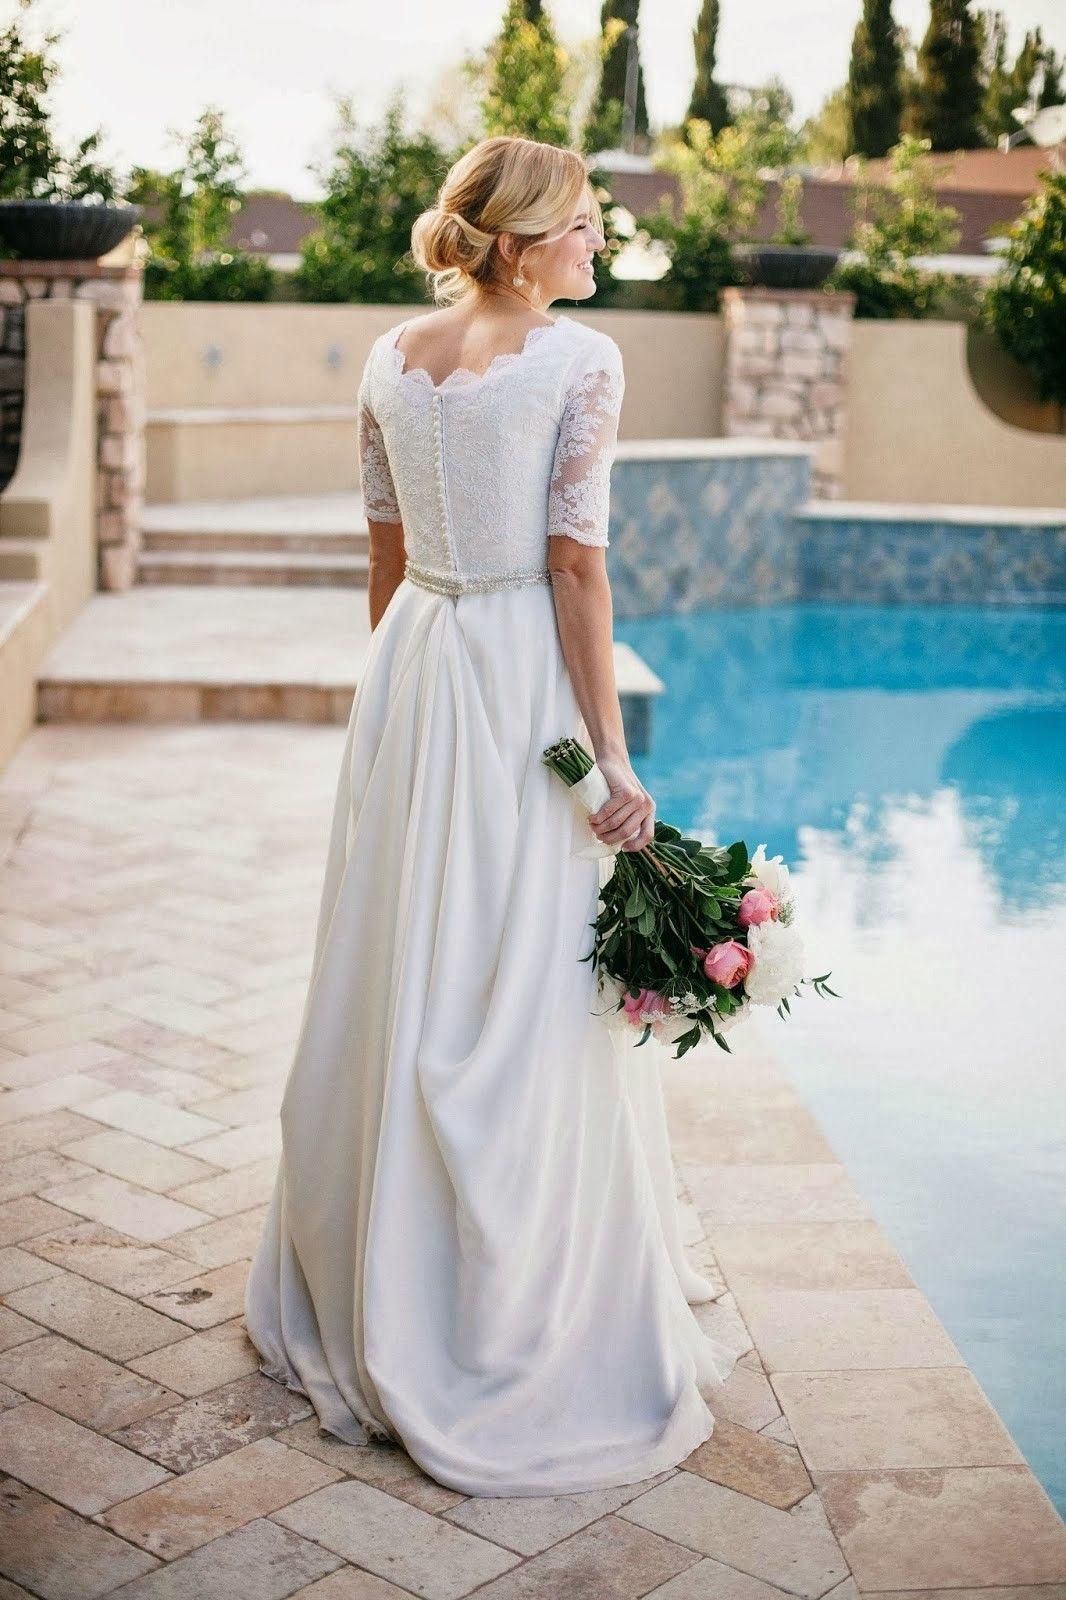 Modest Half Sleeves Lace Wedding Dress Half sleeve